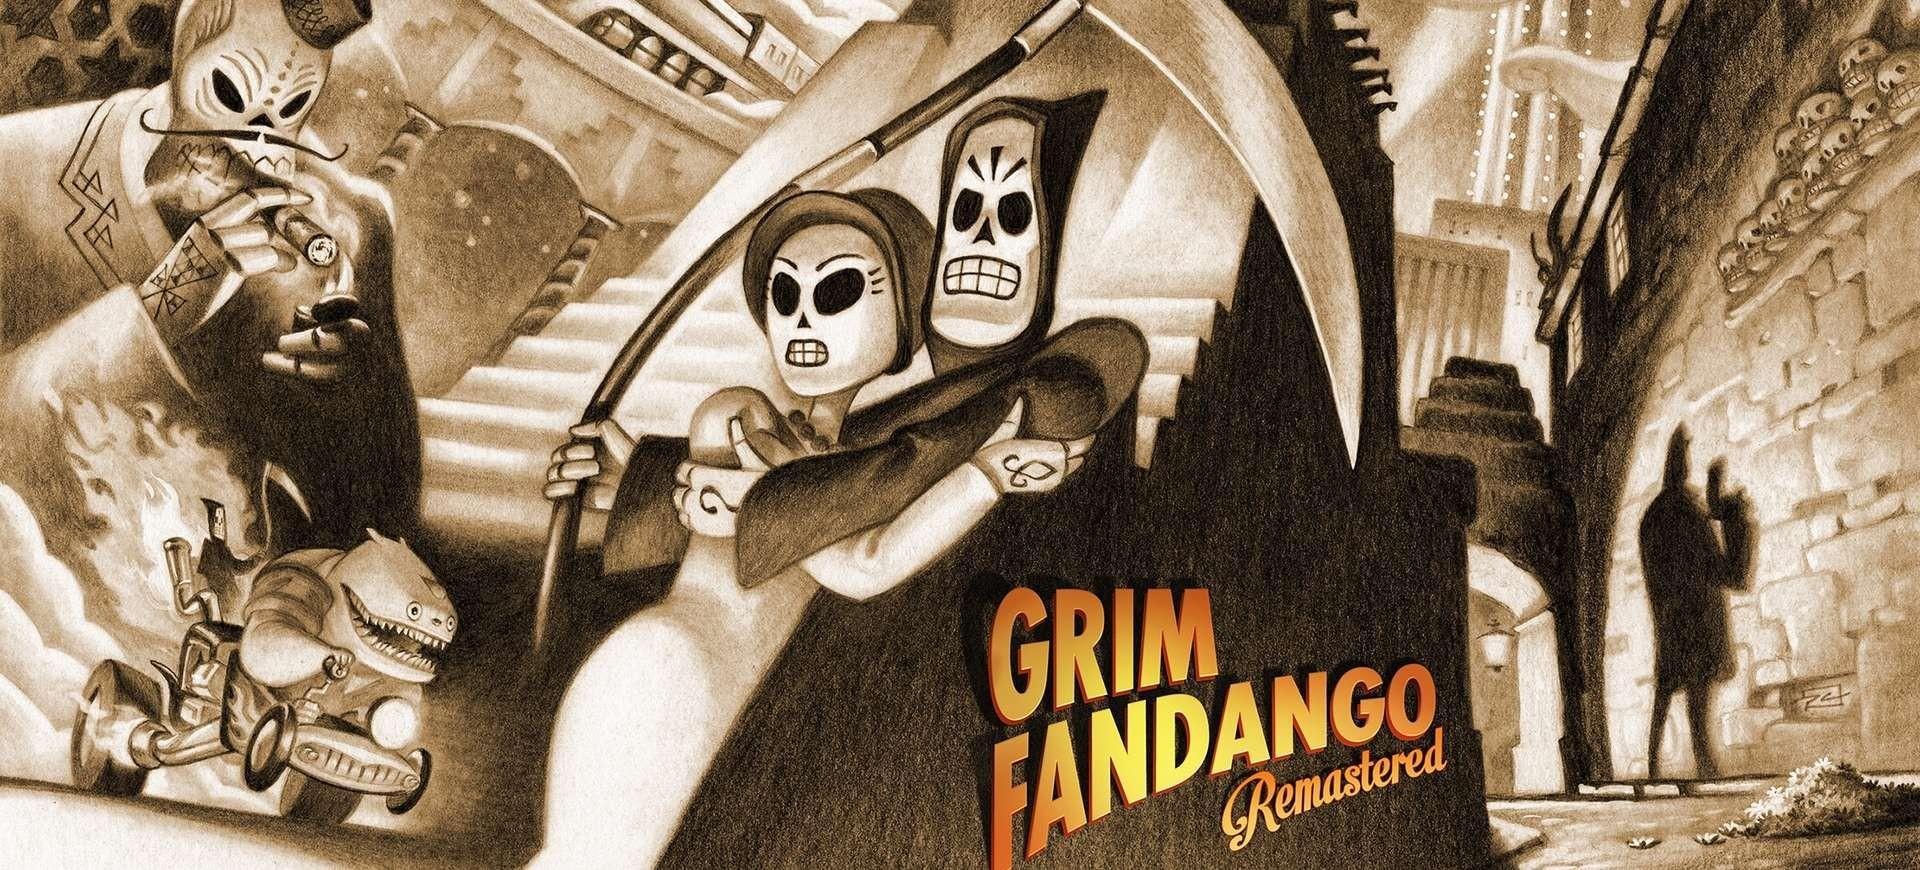 Grim Fandango Remastered - Đánh Giá Game